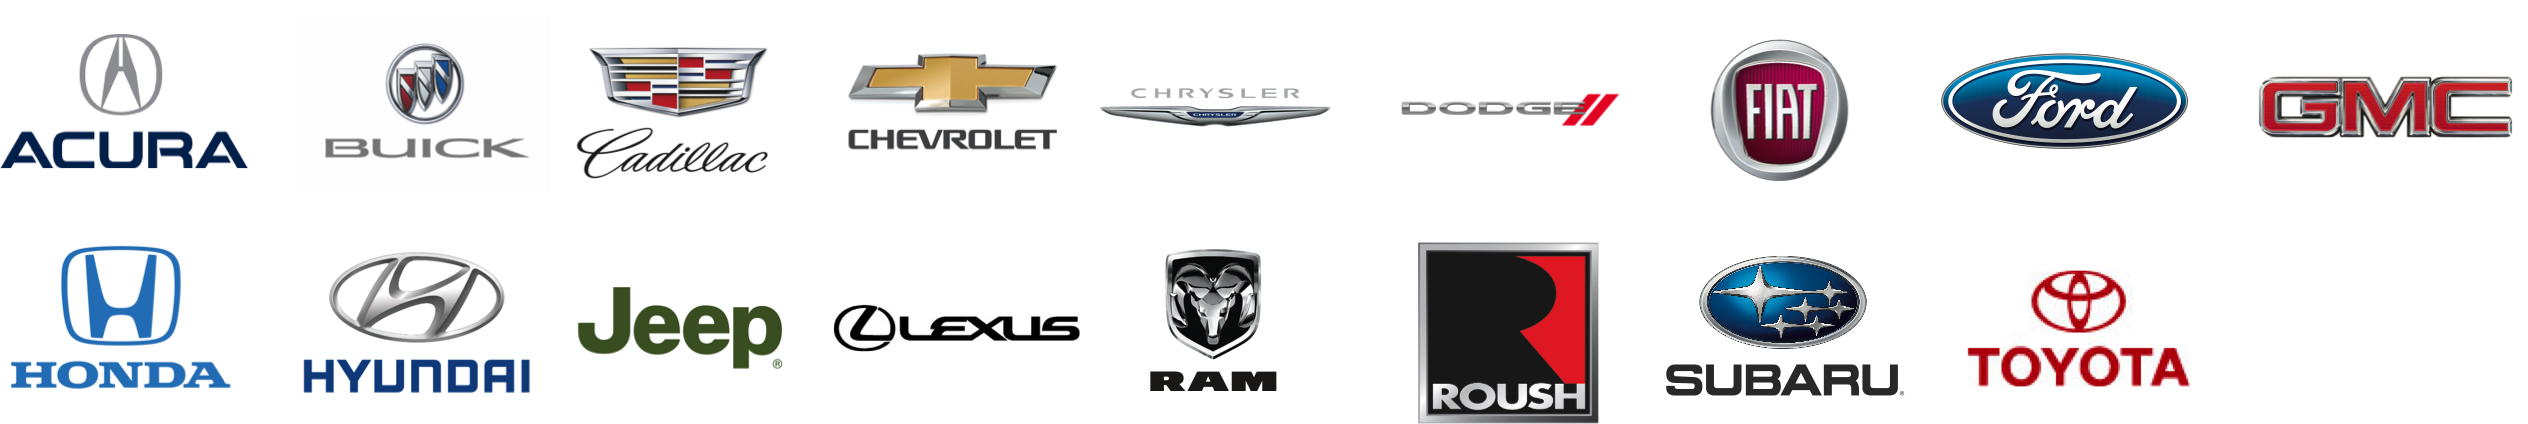 05_17-website-logo